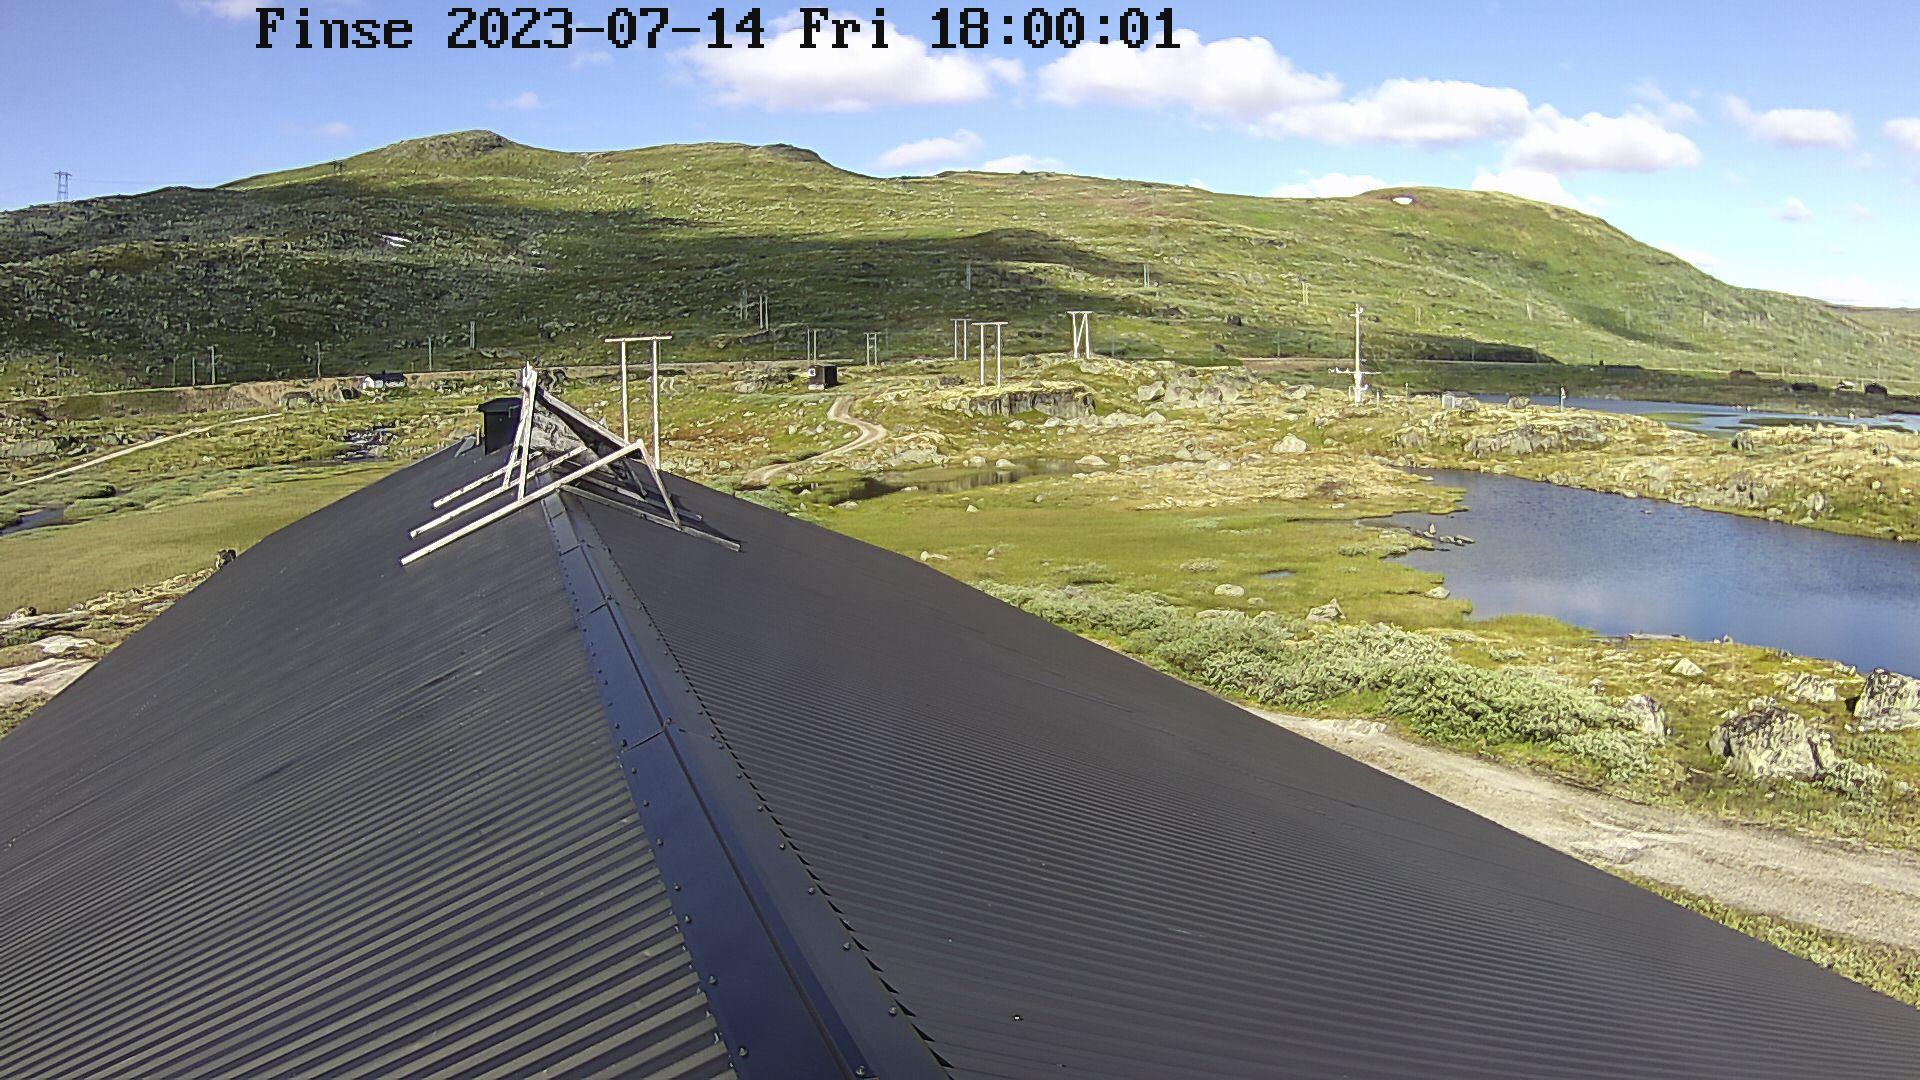 Webcam Finse, Ulvik, Hordaland, Norwegen